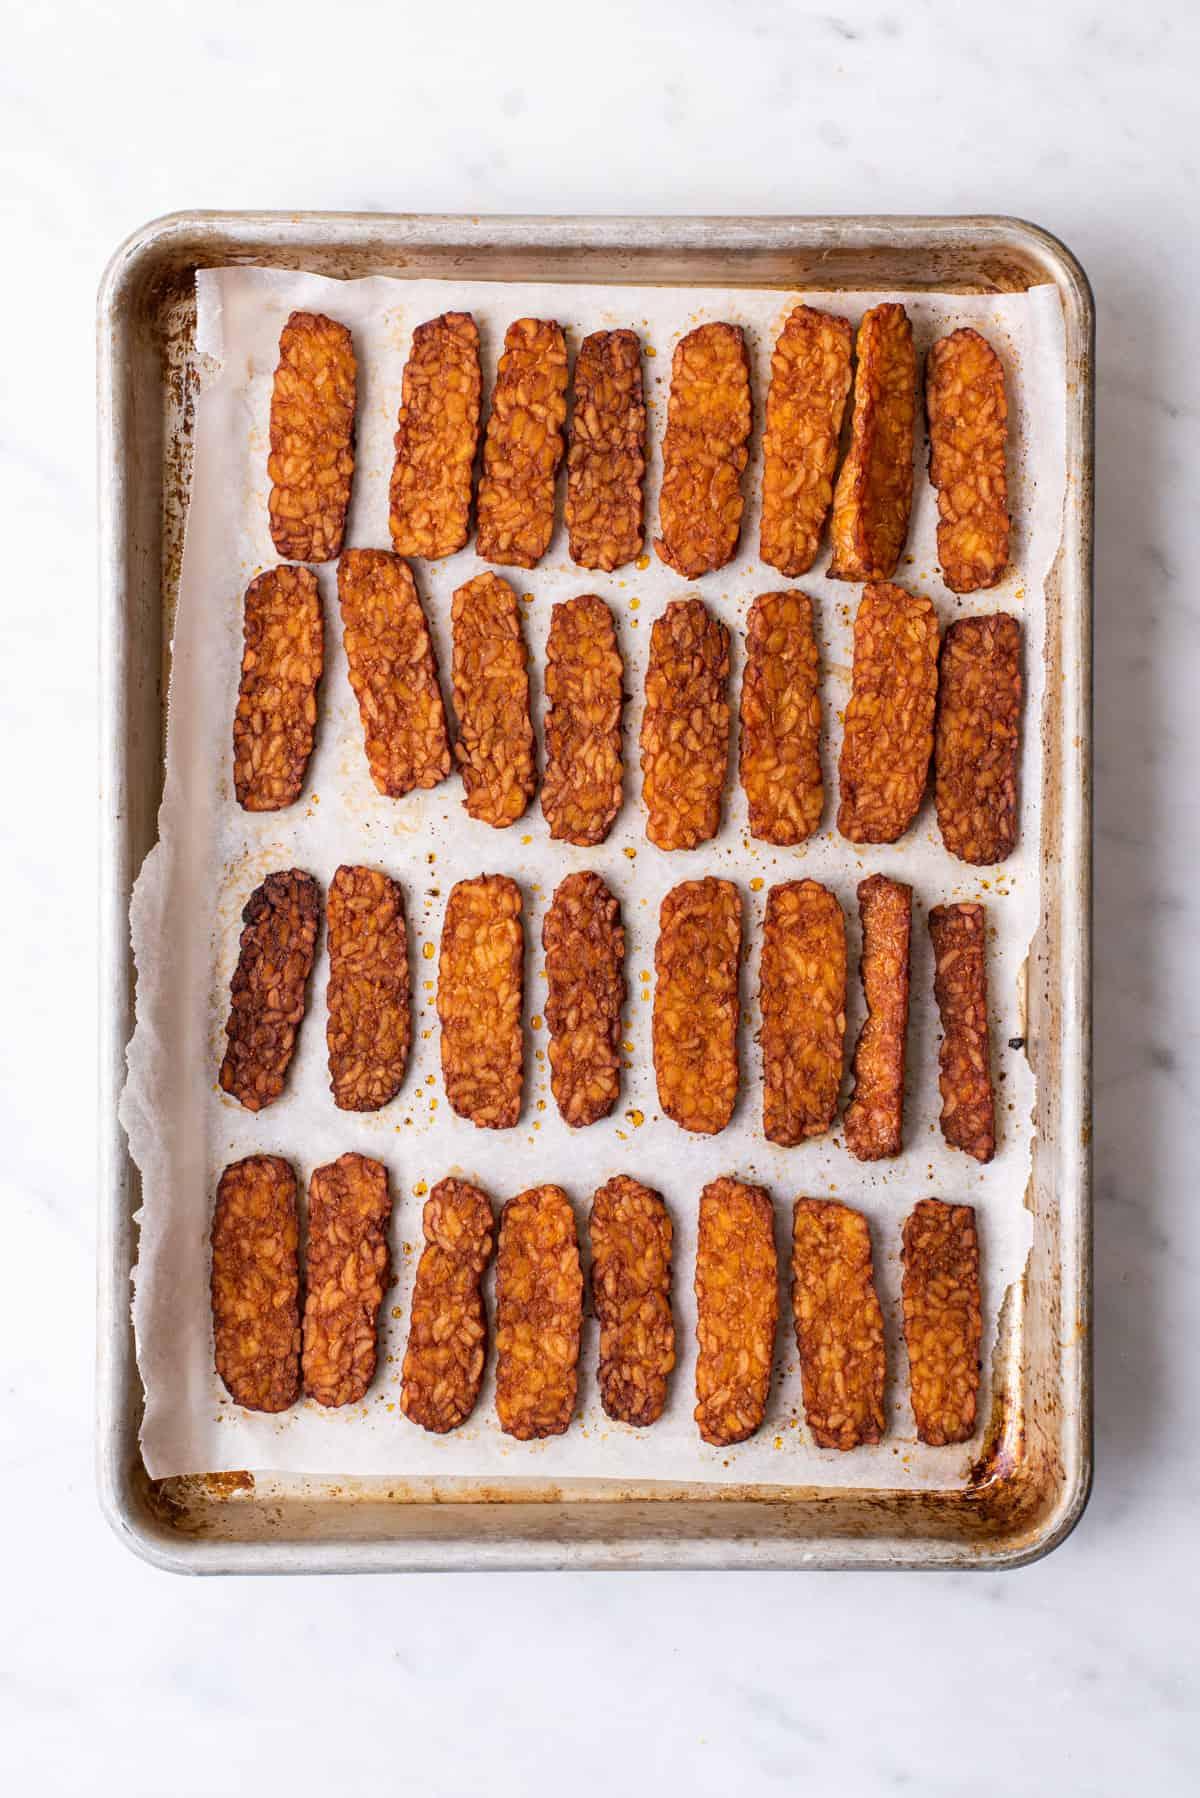 Baked tempeh bacon strips on a quarter-sheet pan.